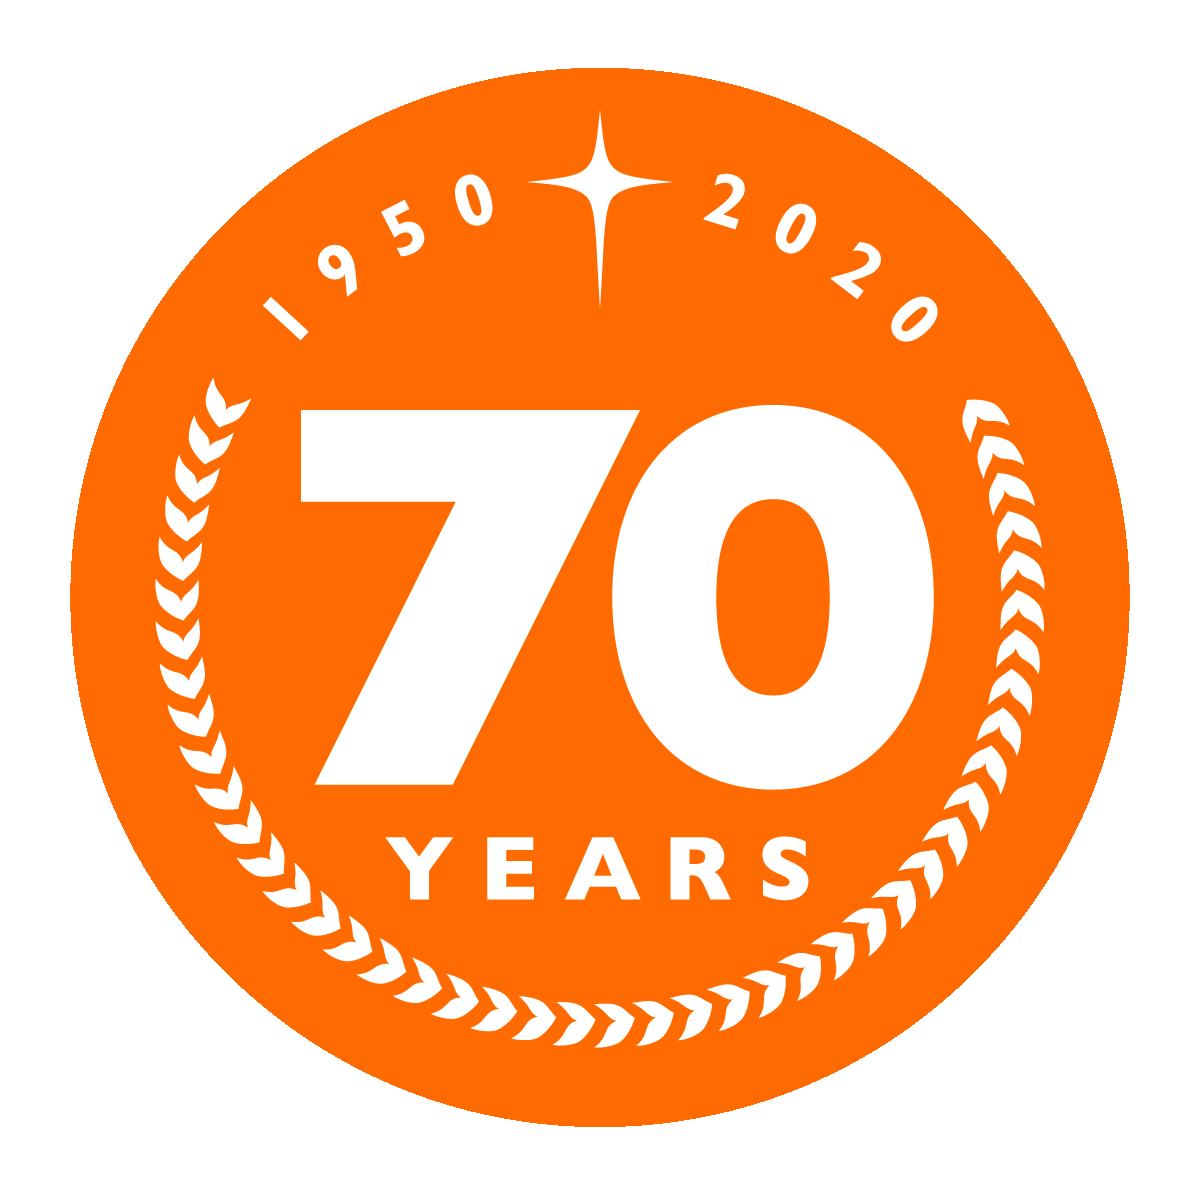 World Vision 70 Years